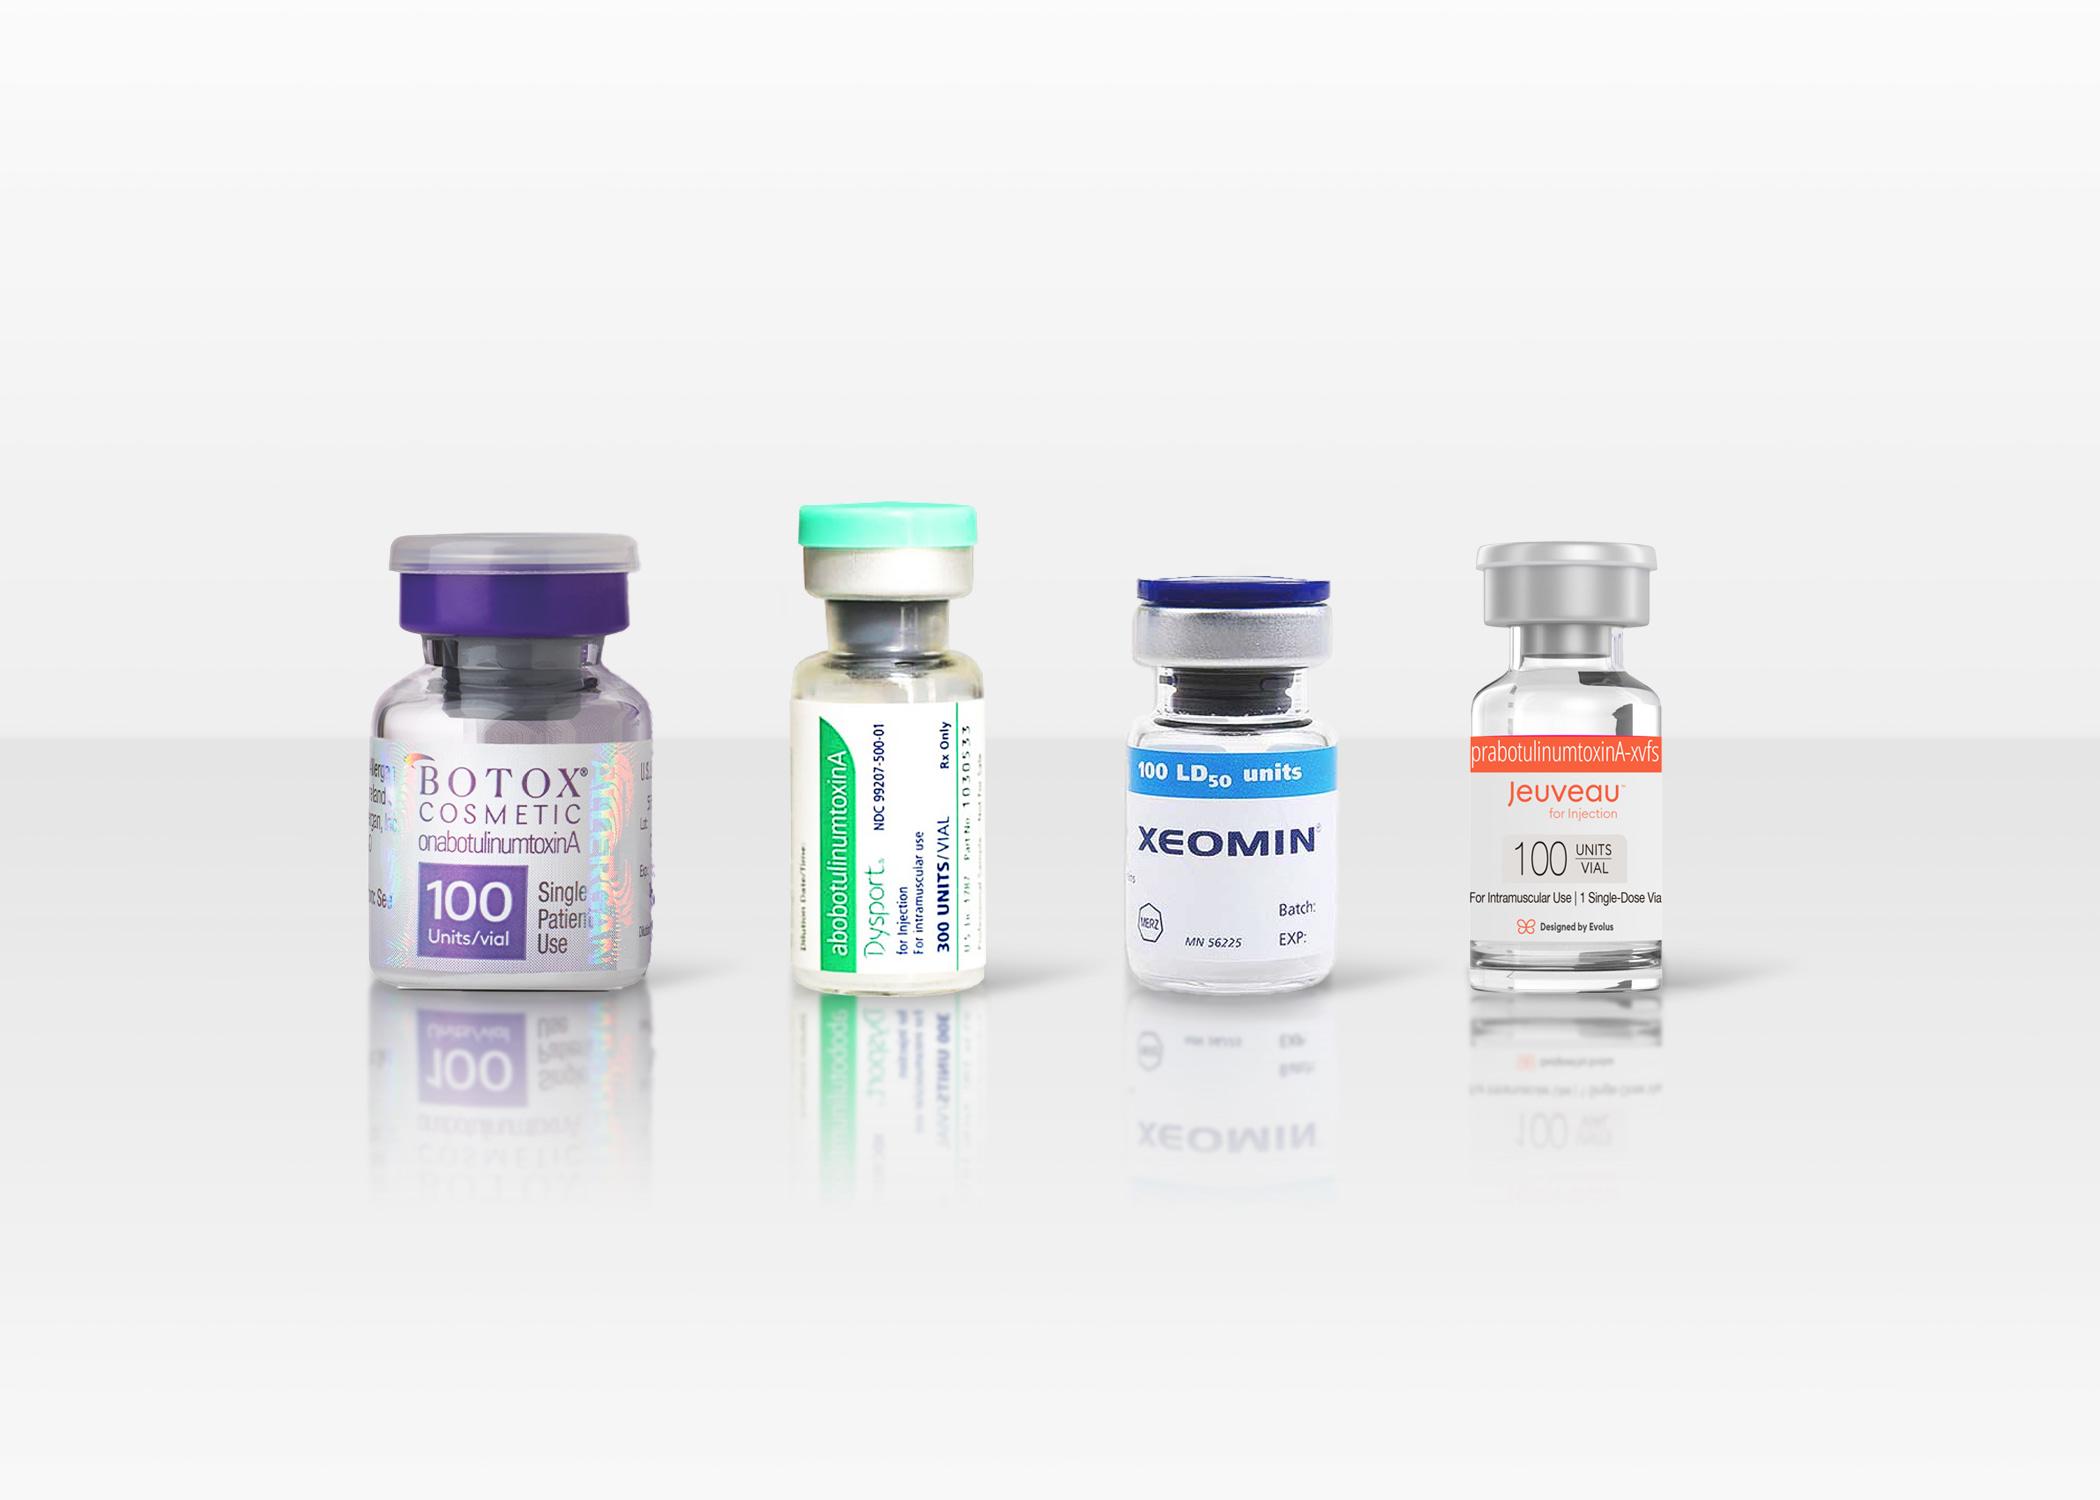 Vials of Botox, Dysport, Xeomin, and Jeuveau.